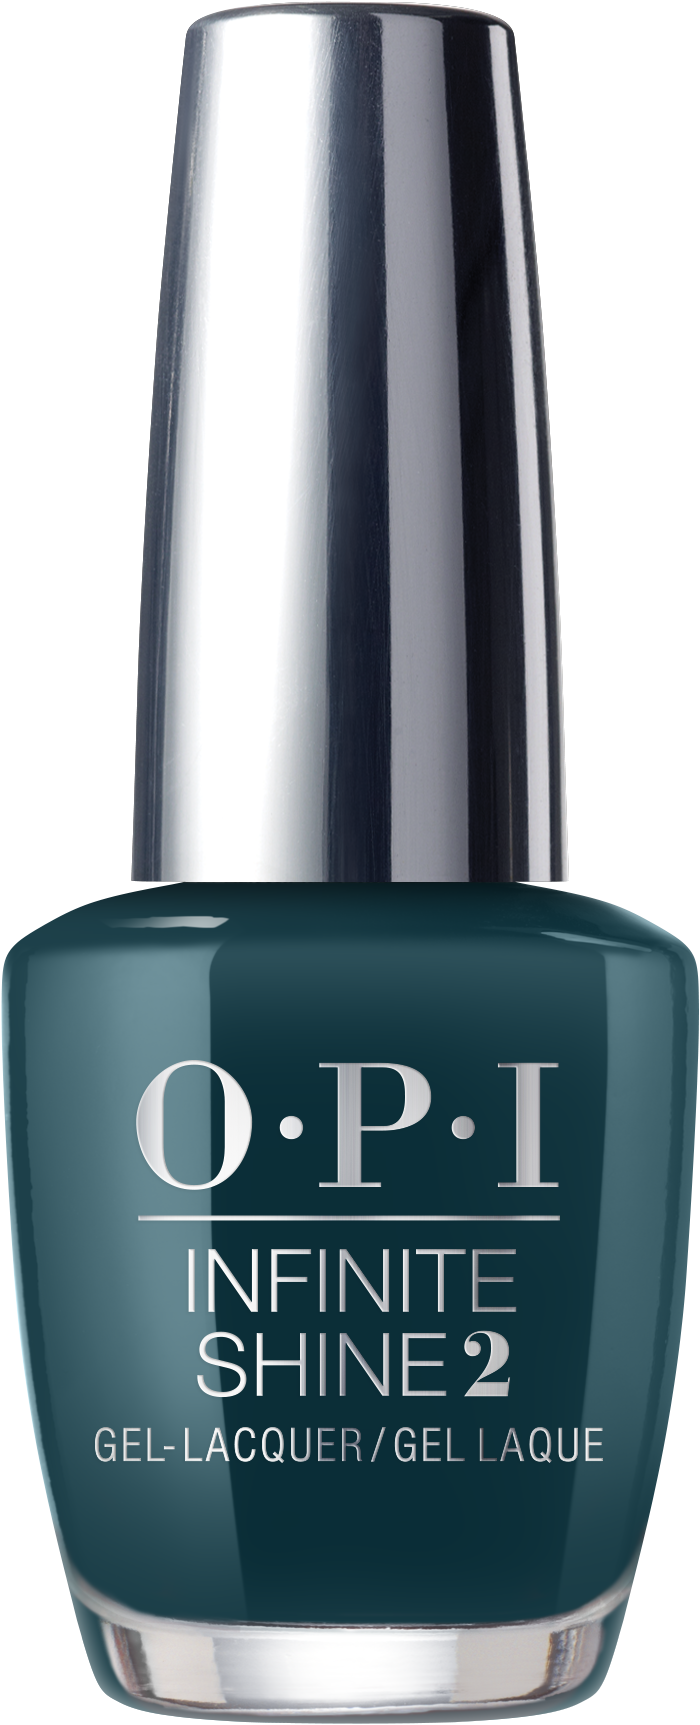 OPI Лак для ногтей / CIA=Color is Awesome Infinite Shine 15 мл opi infinite shine top coat верхнее покрытие для ногтей 15 мл